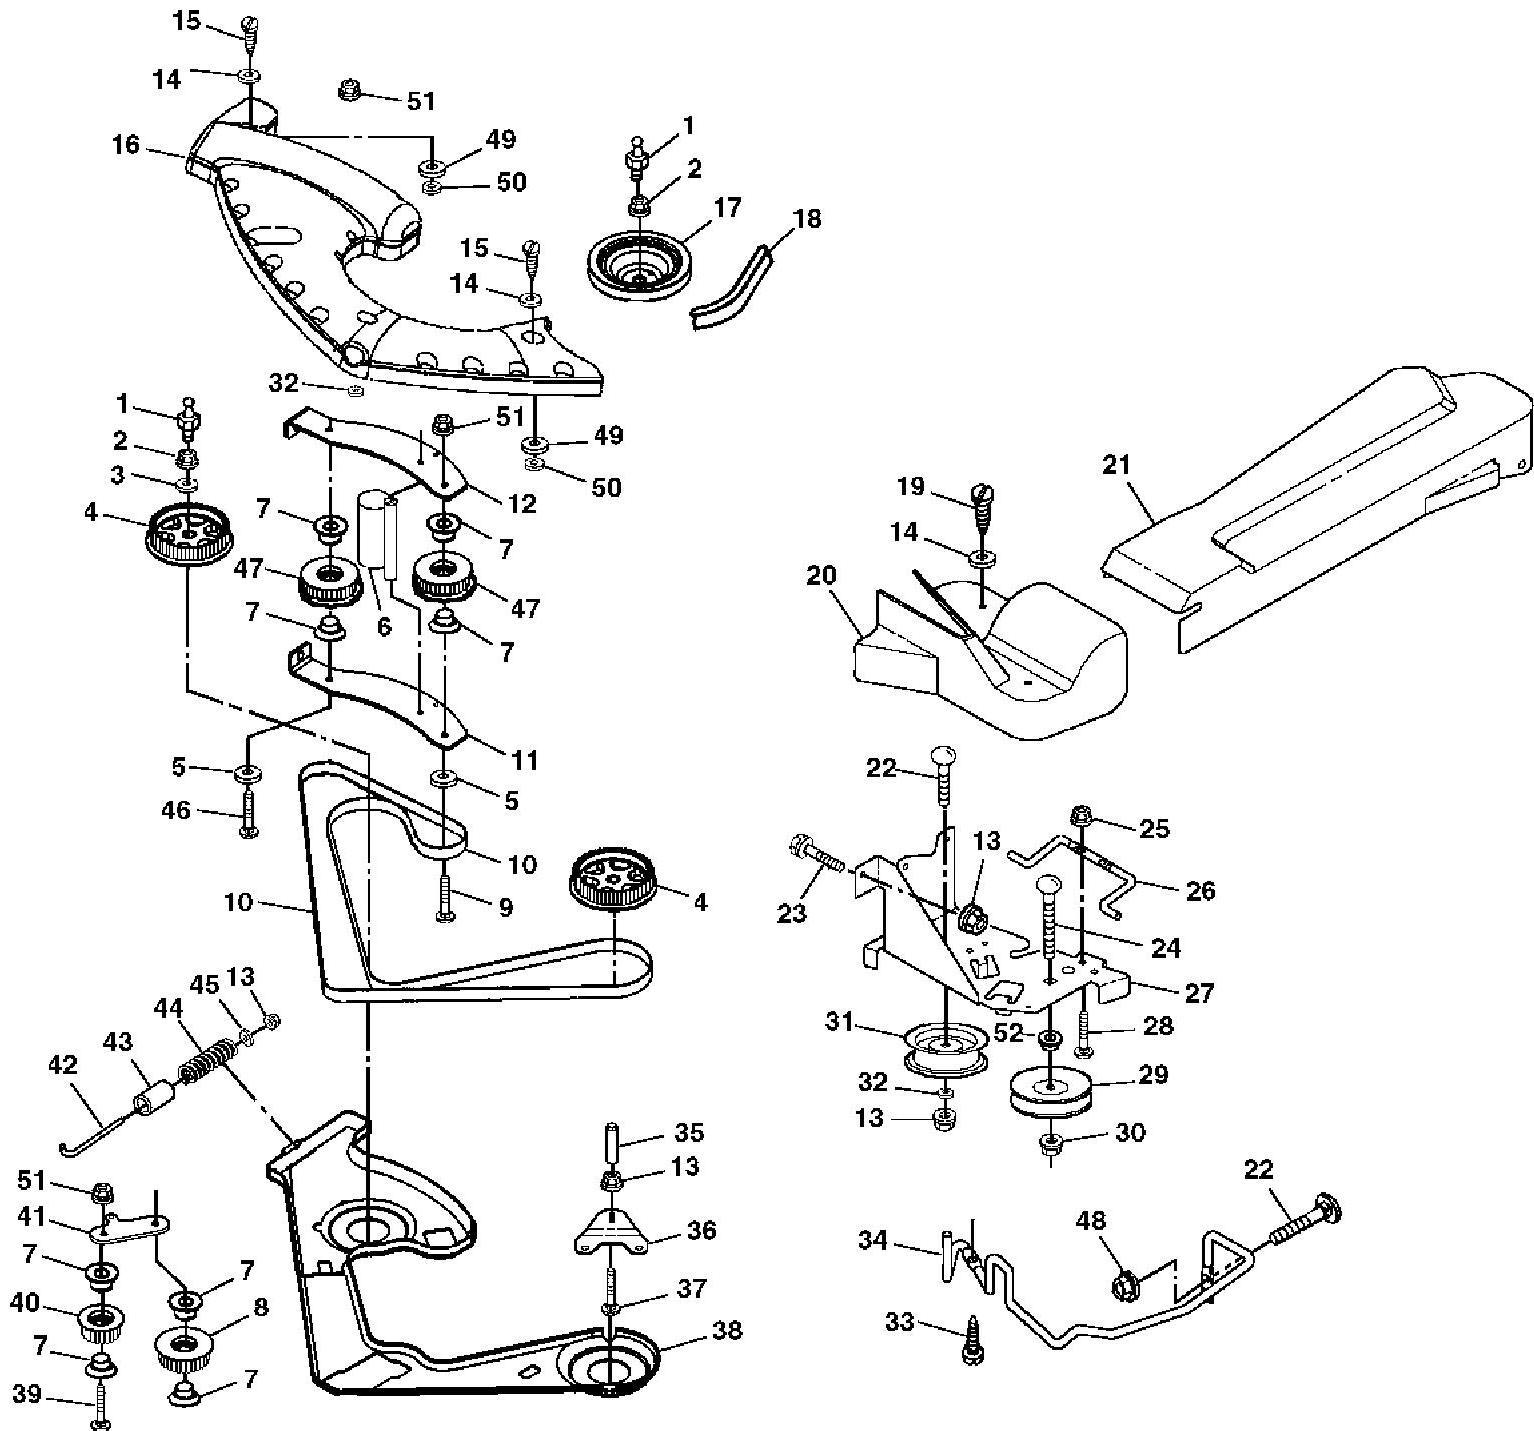 John Deere LTR180 Garden Tractor Spare Parts